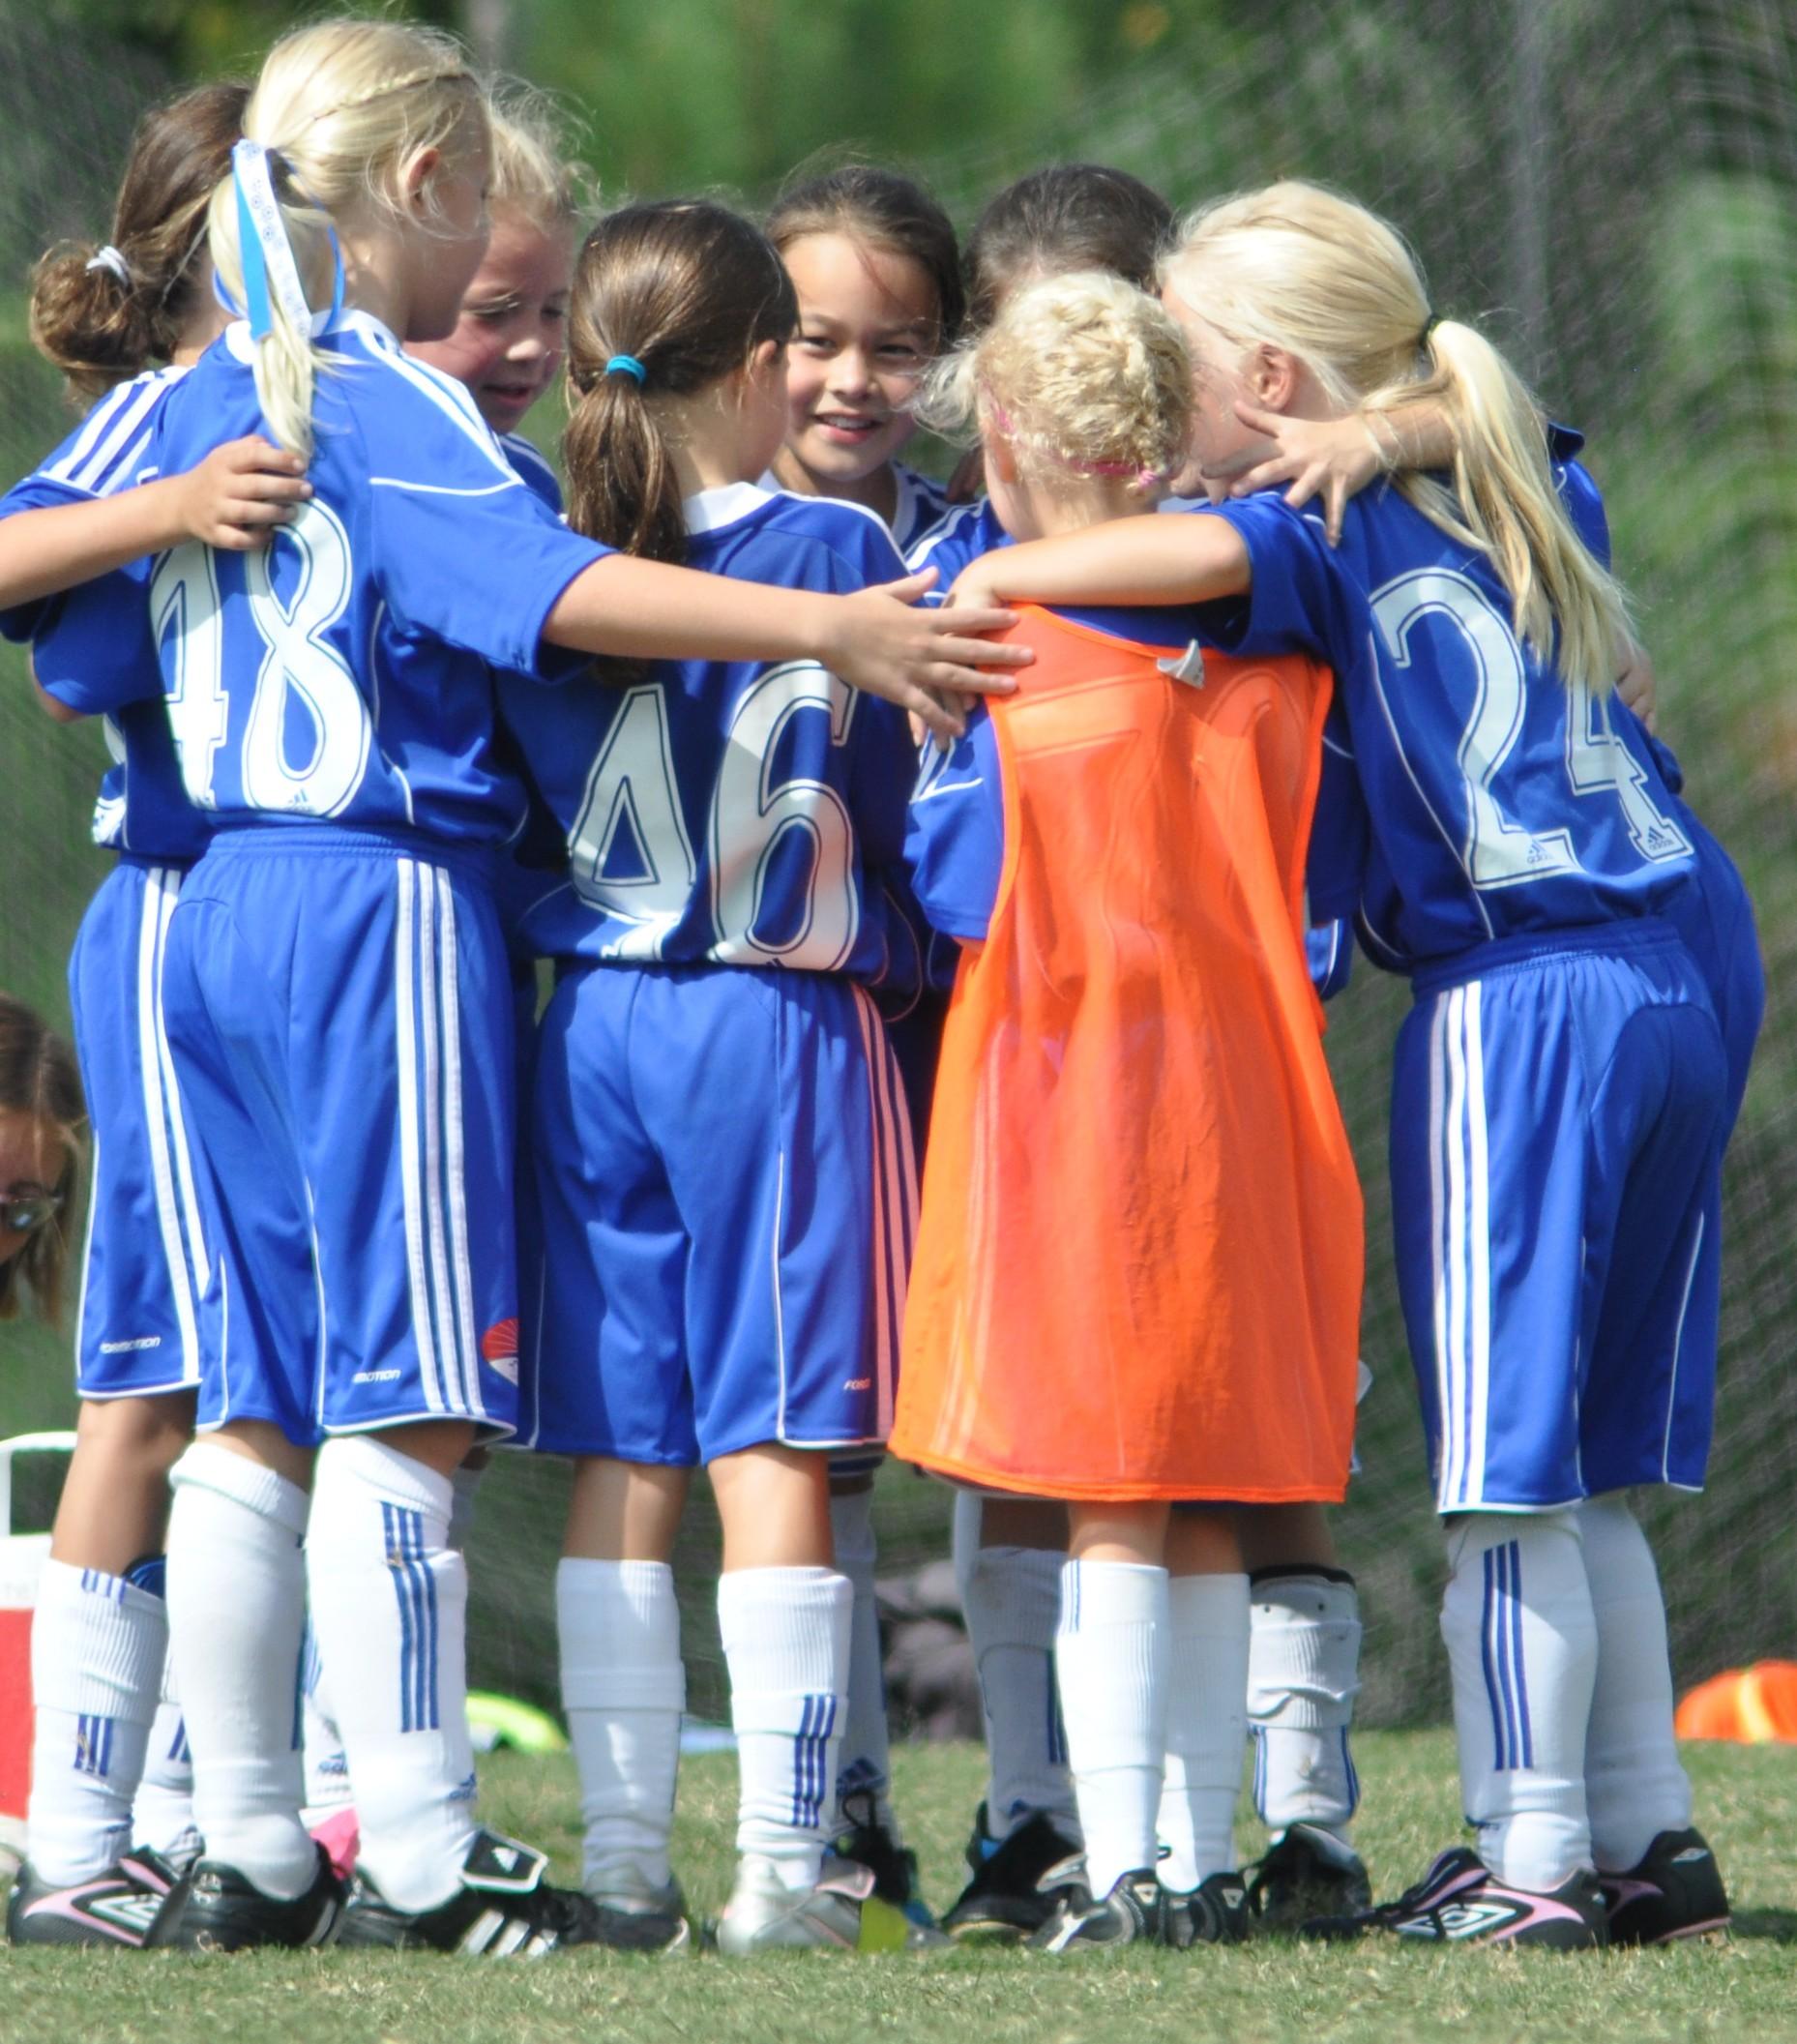 nasa soccer girls - photo #6